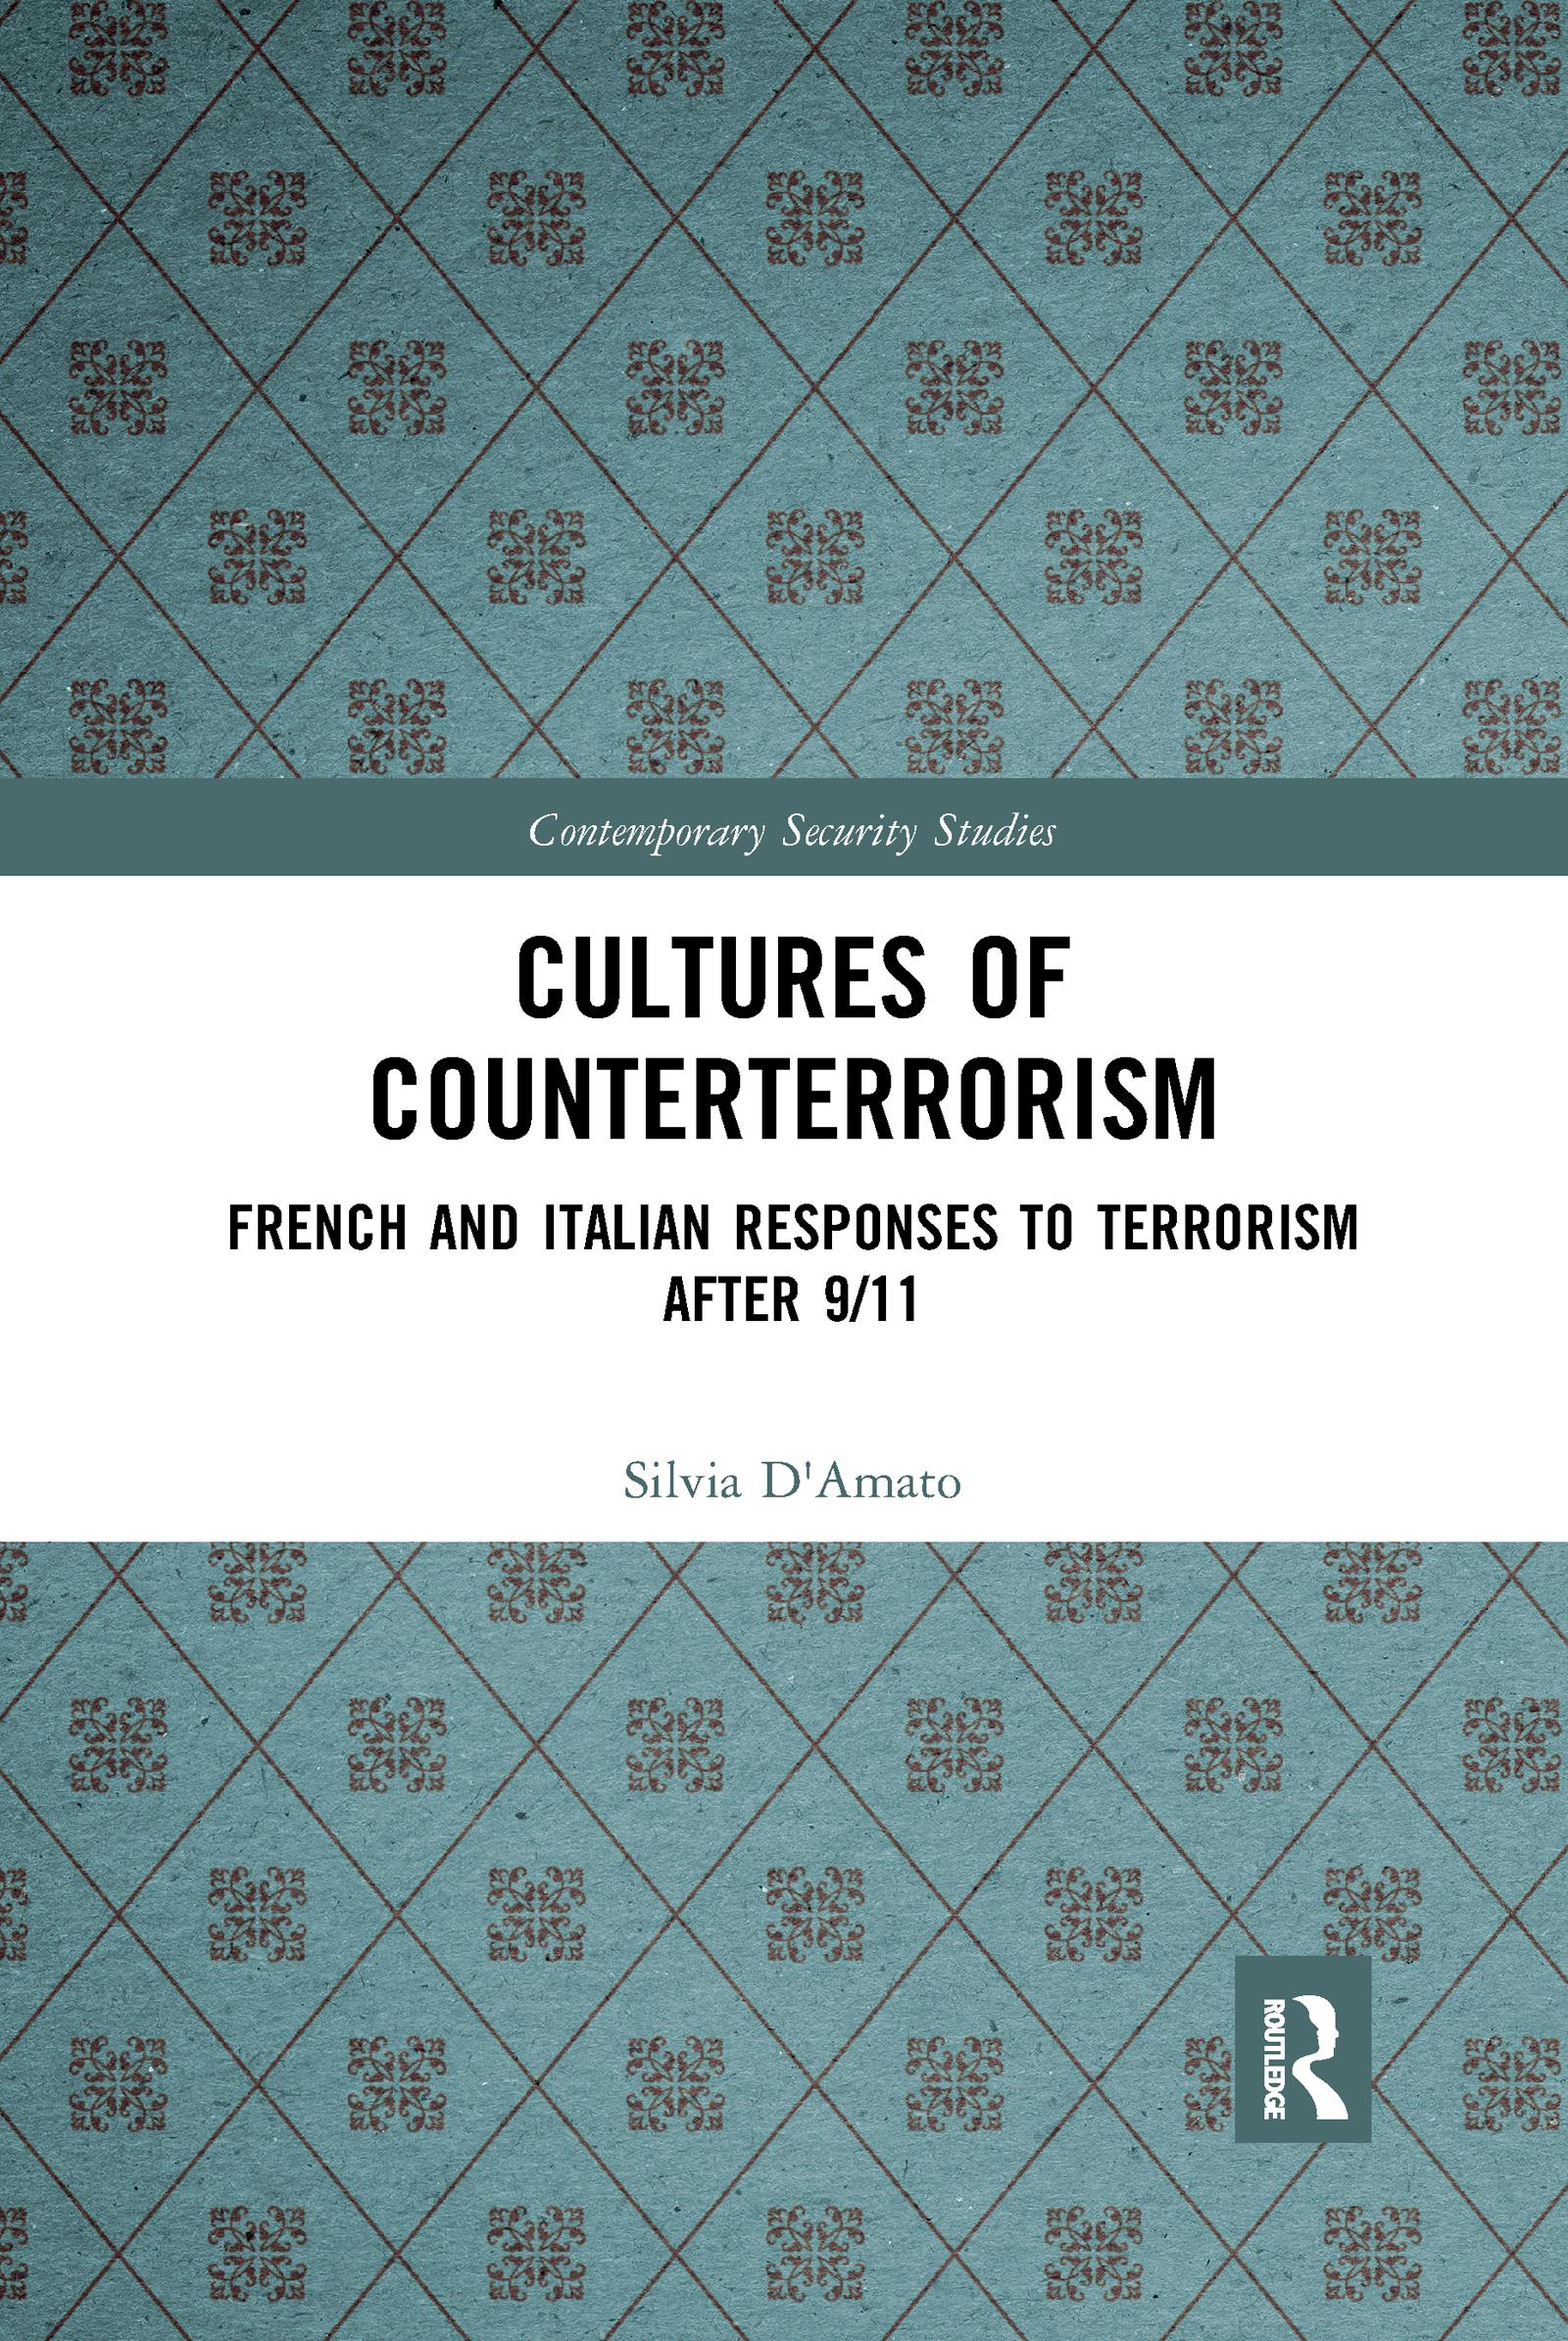 Cultures of Counterterrorism